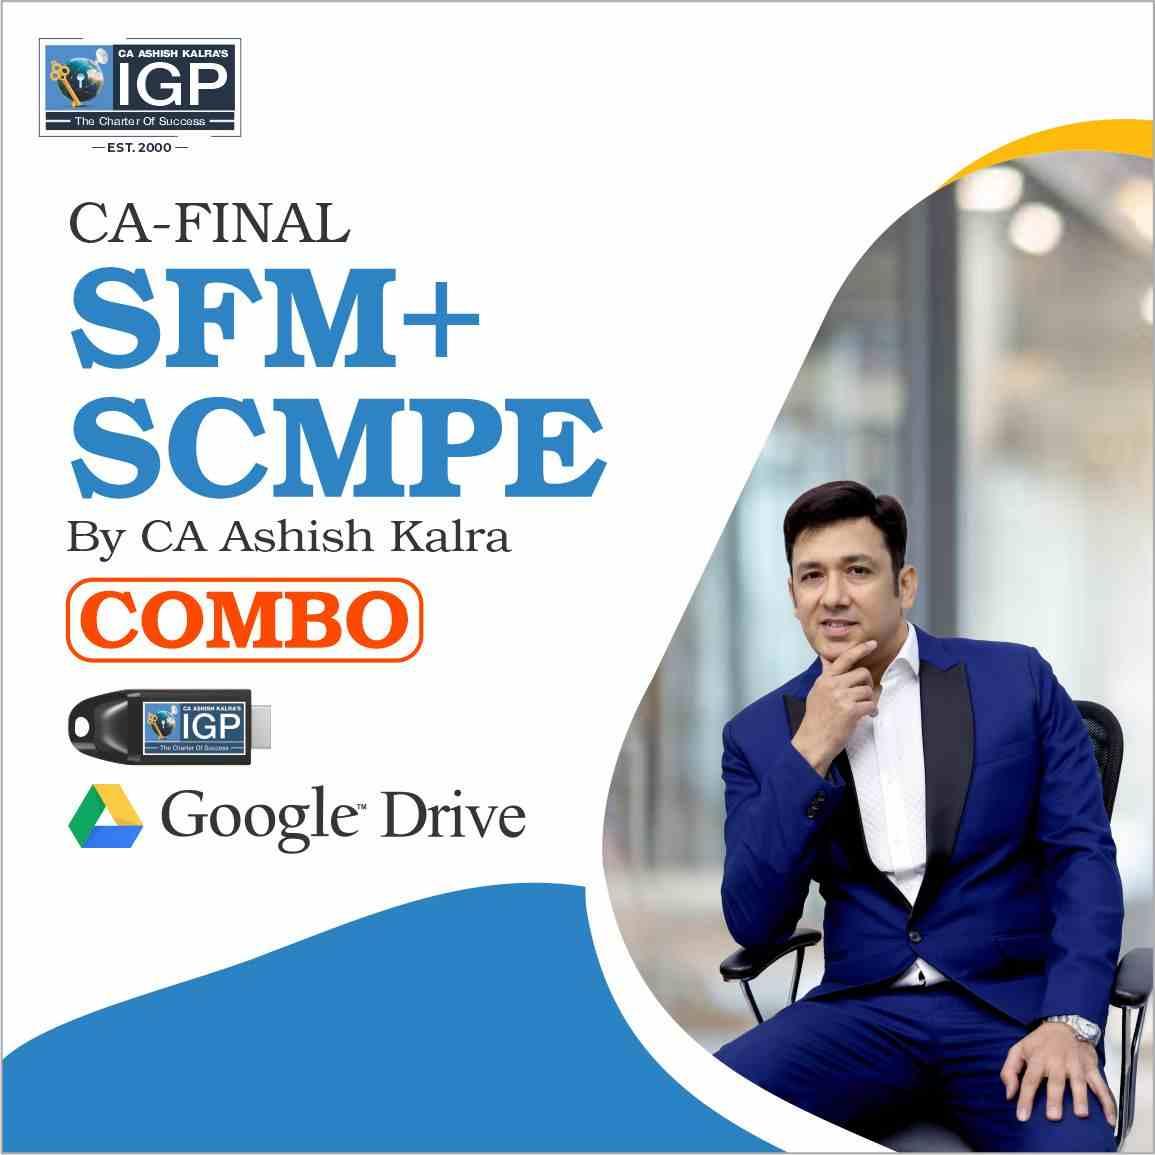 -CA-Final-Strategic Financial Management (SFM)- CA Ashish Kalra